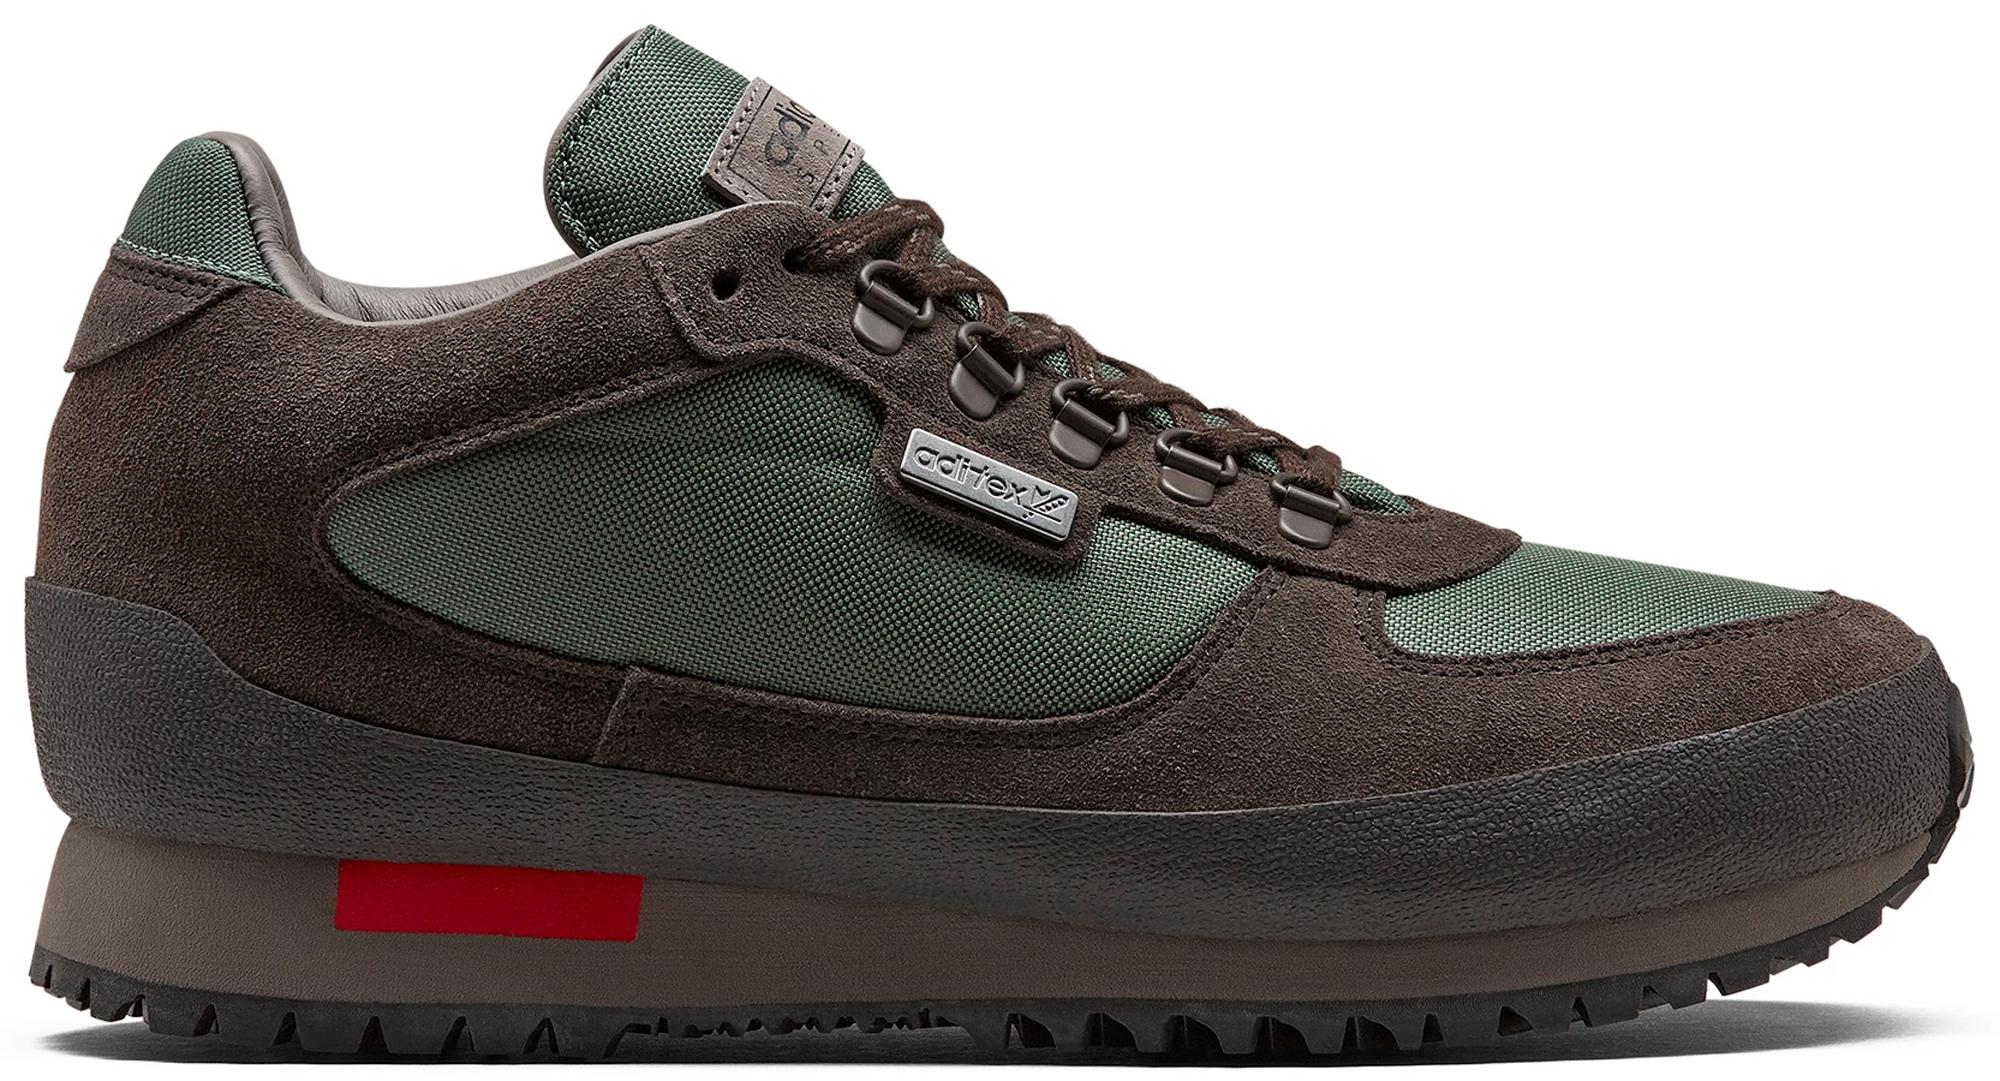 adidas Winterhill Spzl Brown - EF1157